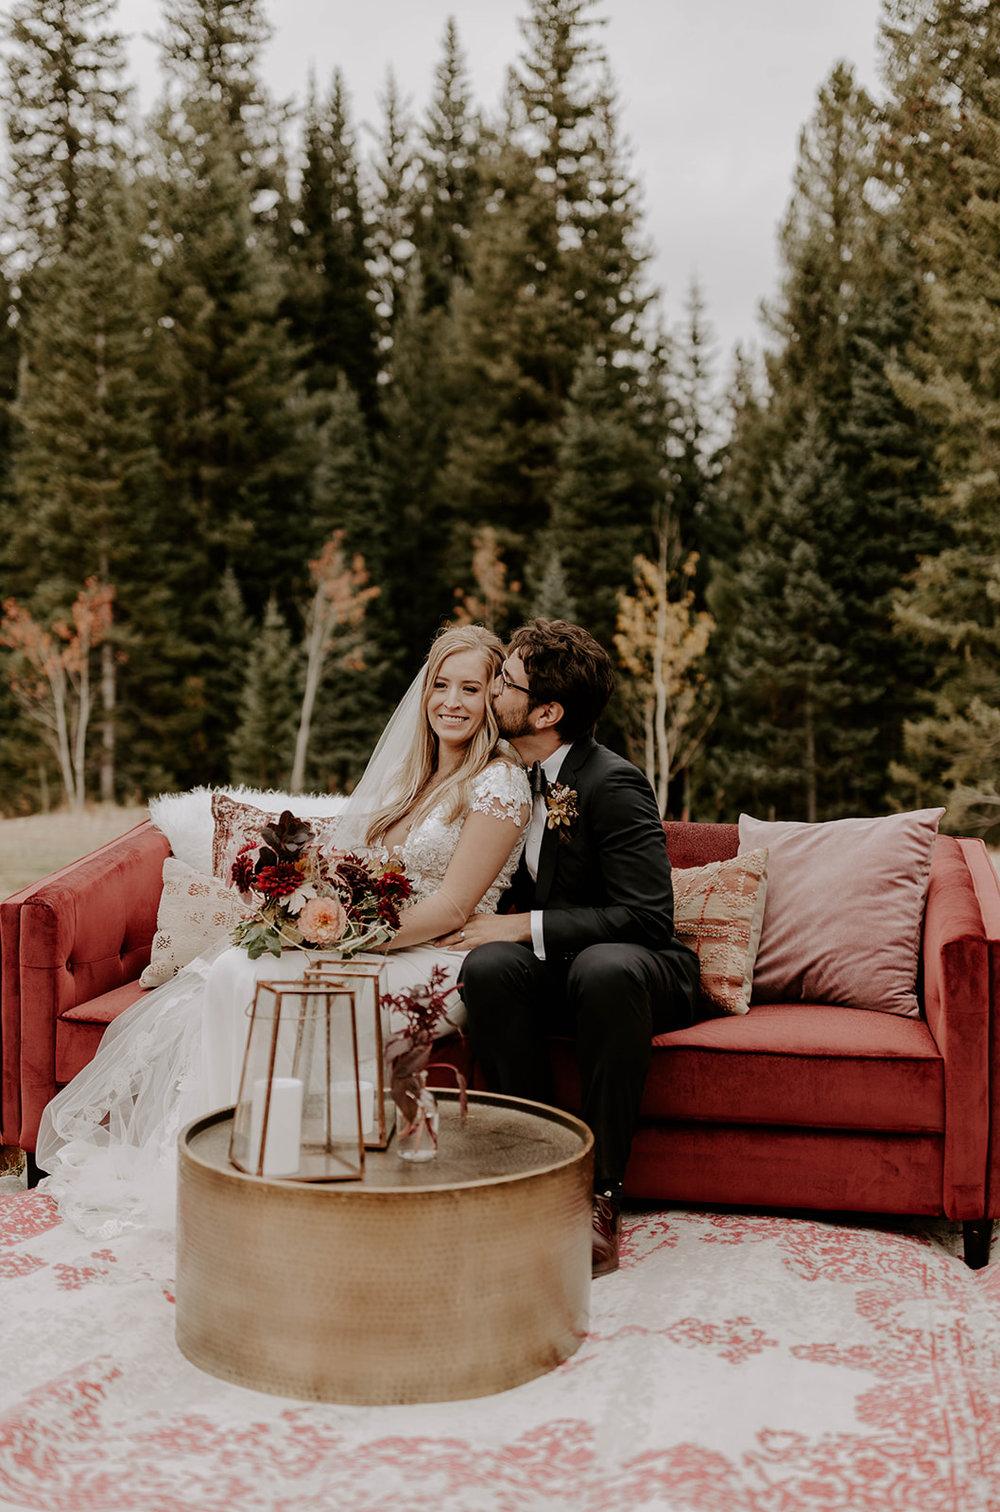 karra leigh photography- jenny and julio wedding607.jpg